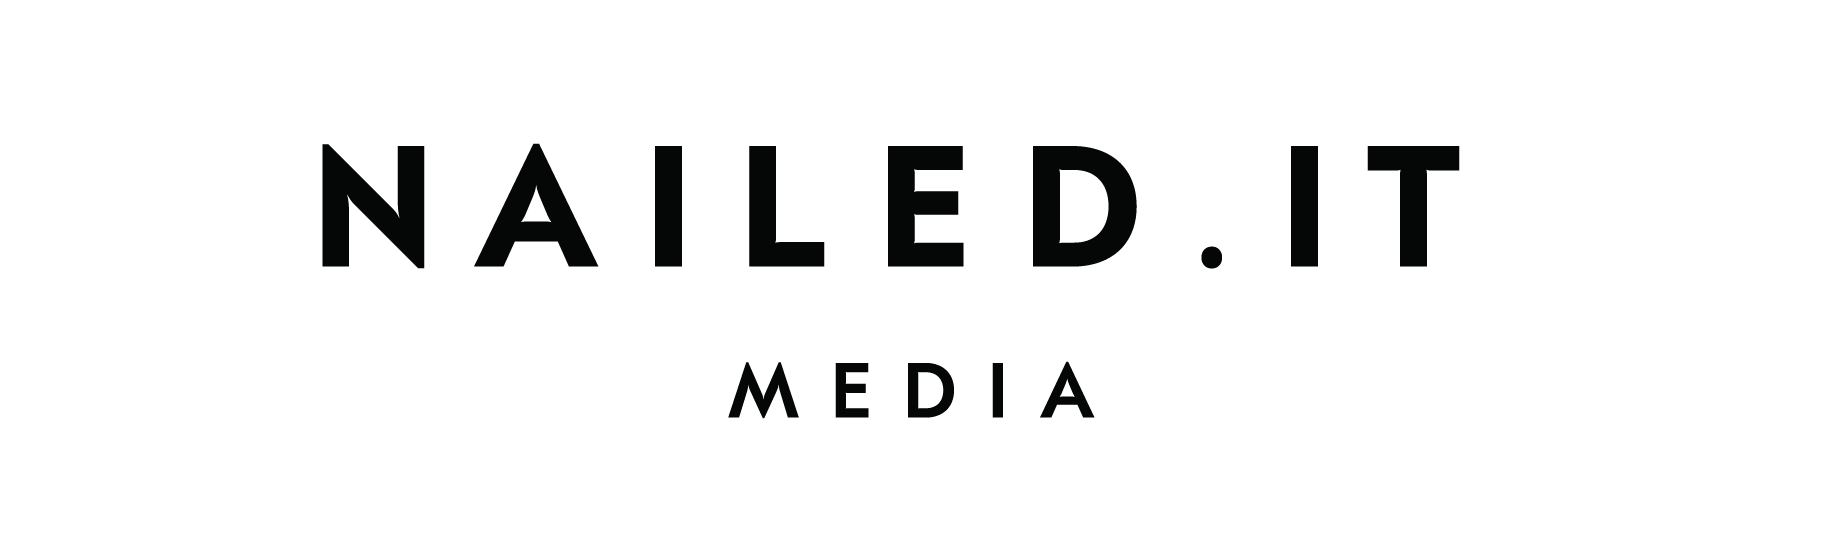 NaileditMedia-Black Logo